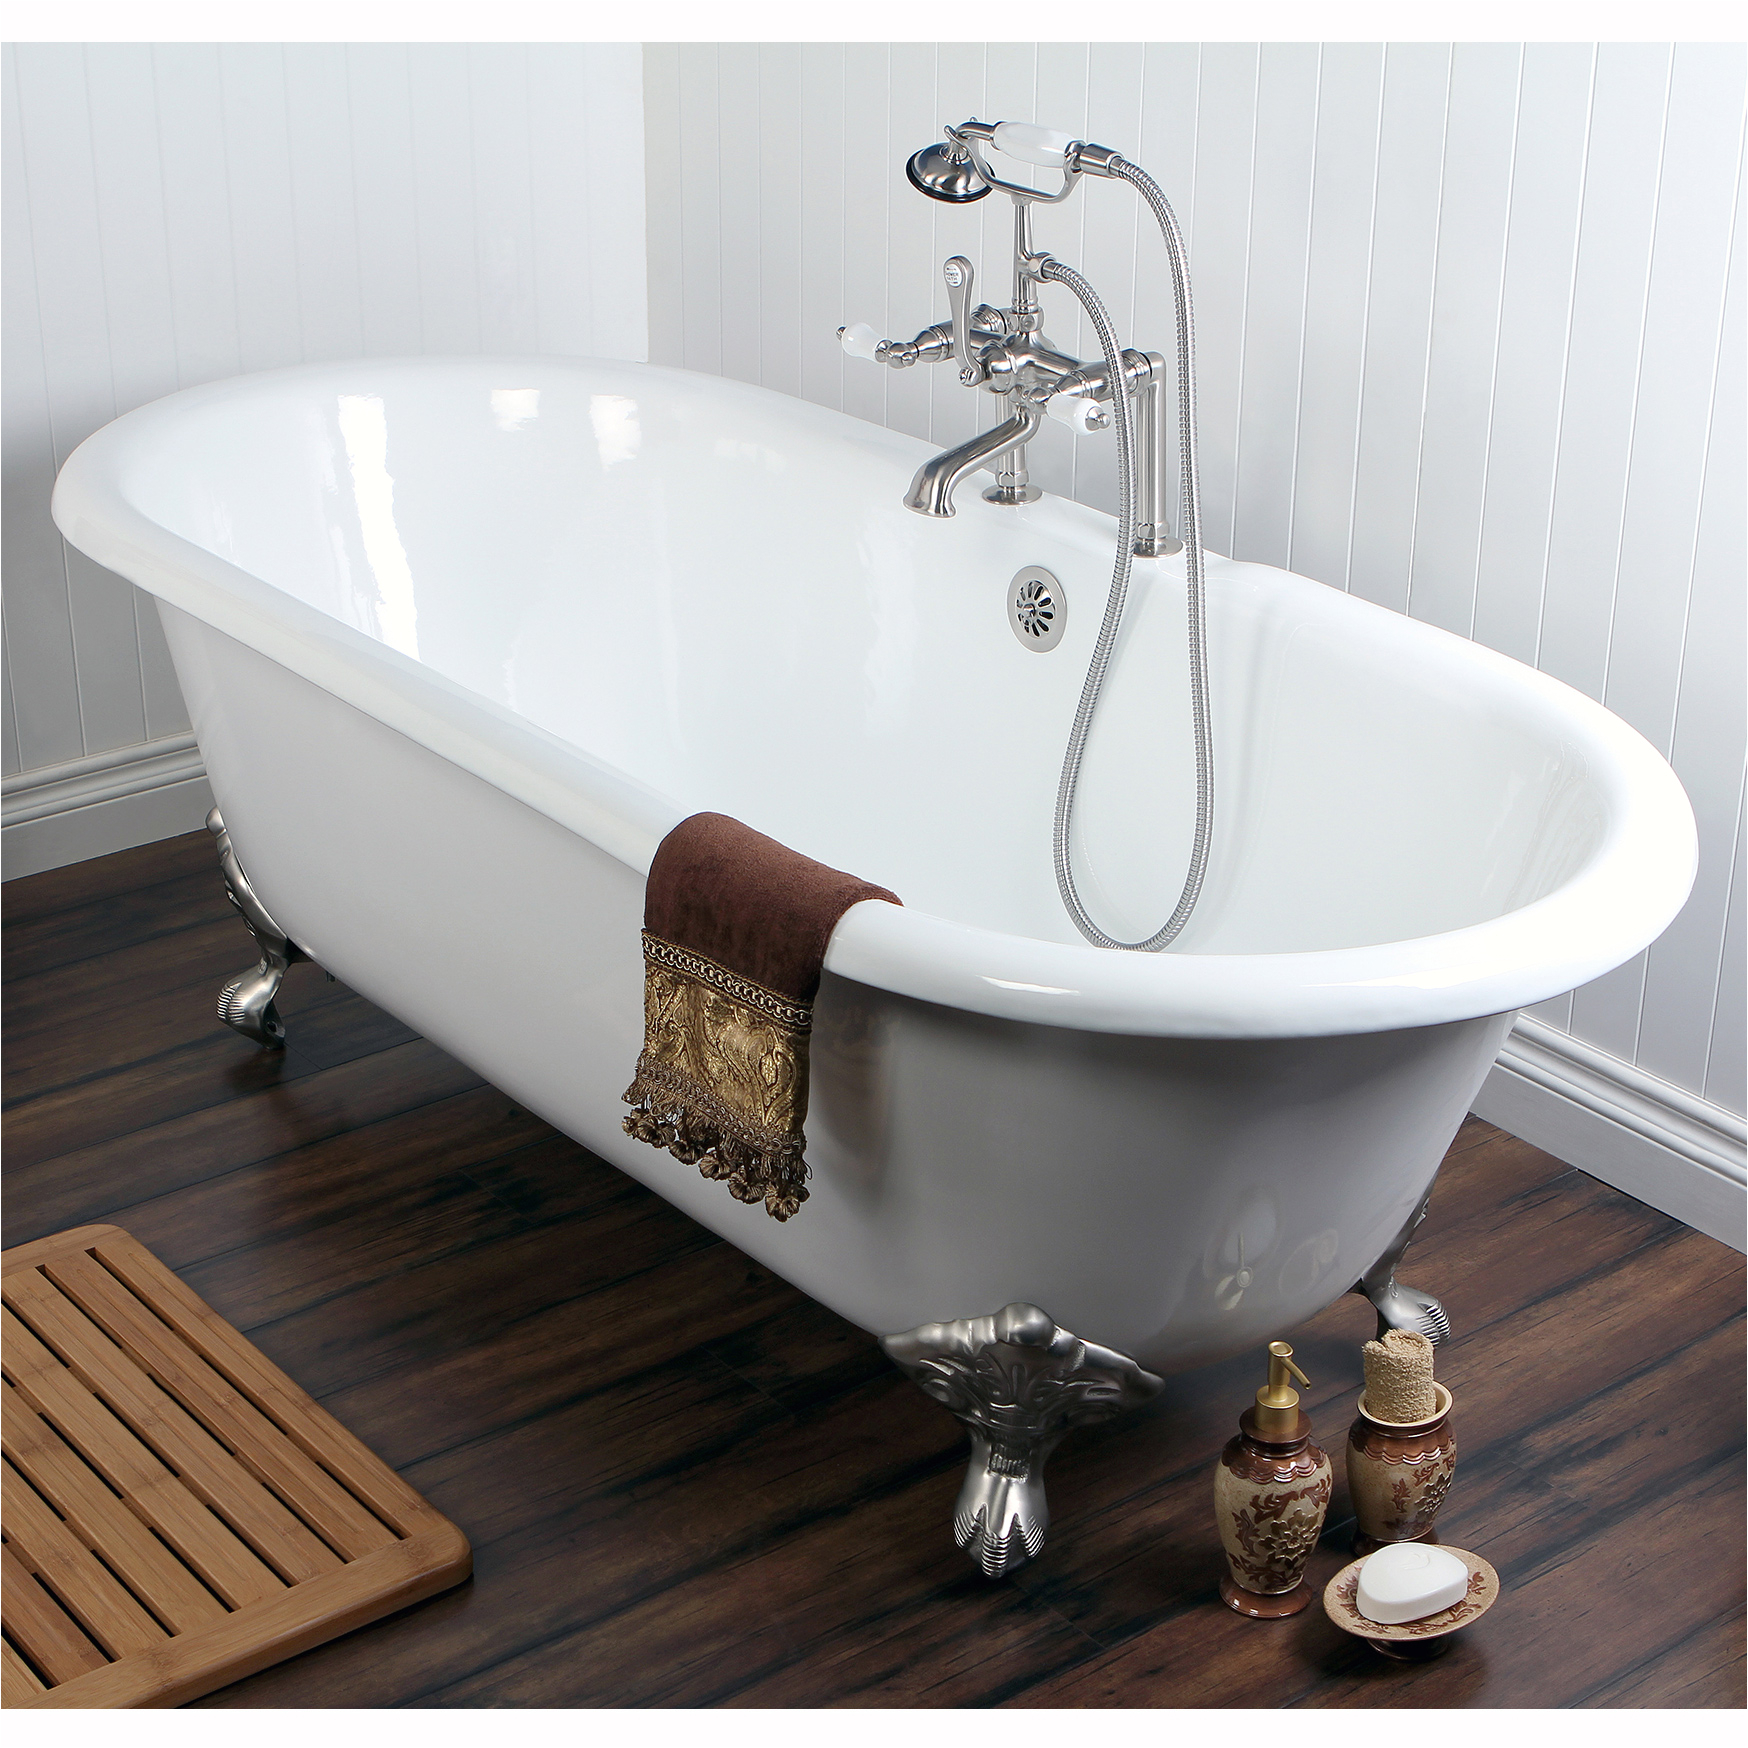 Claw Foot Bathtubs for Sale Beautiful Clawfoot Tubs